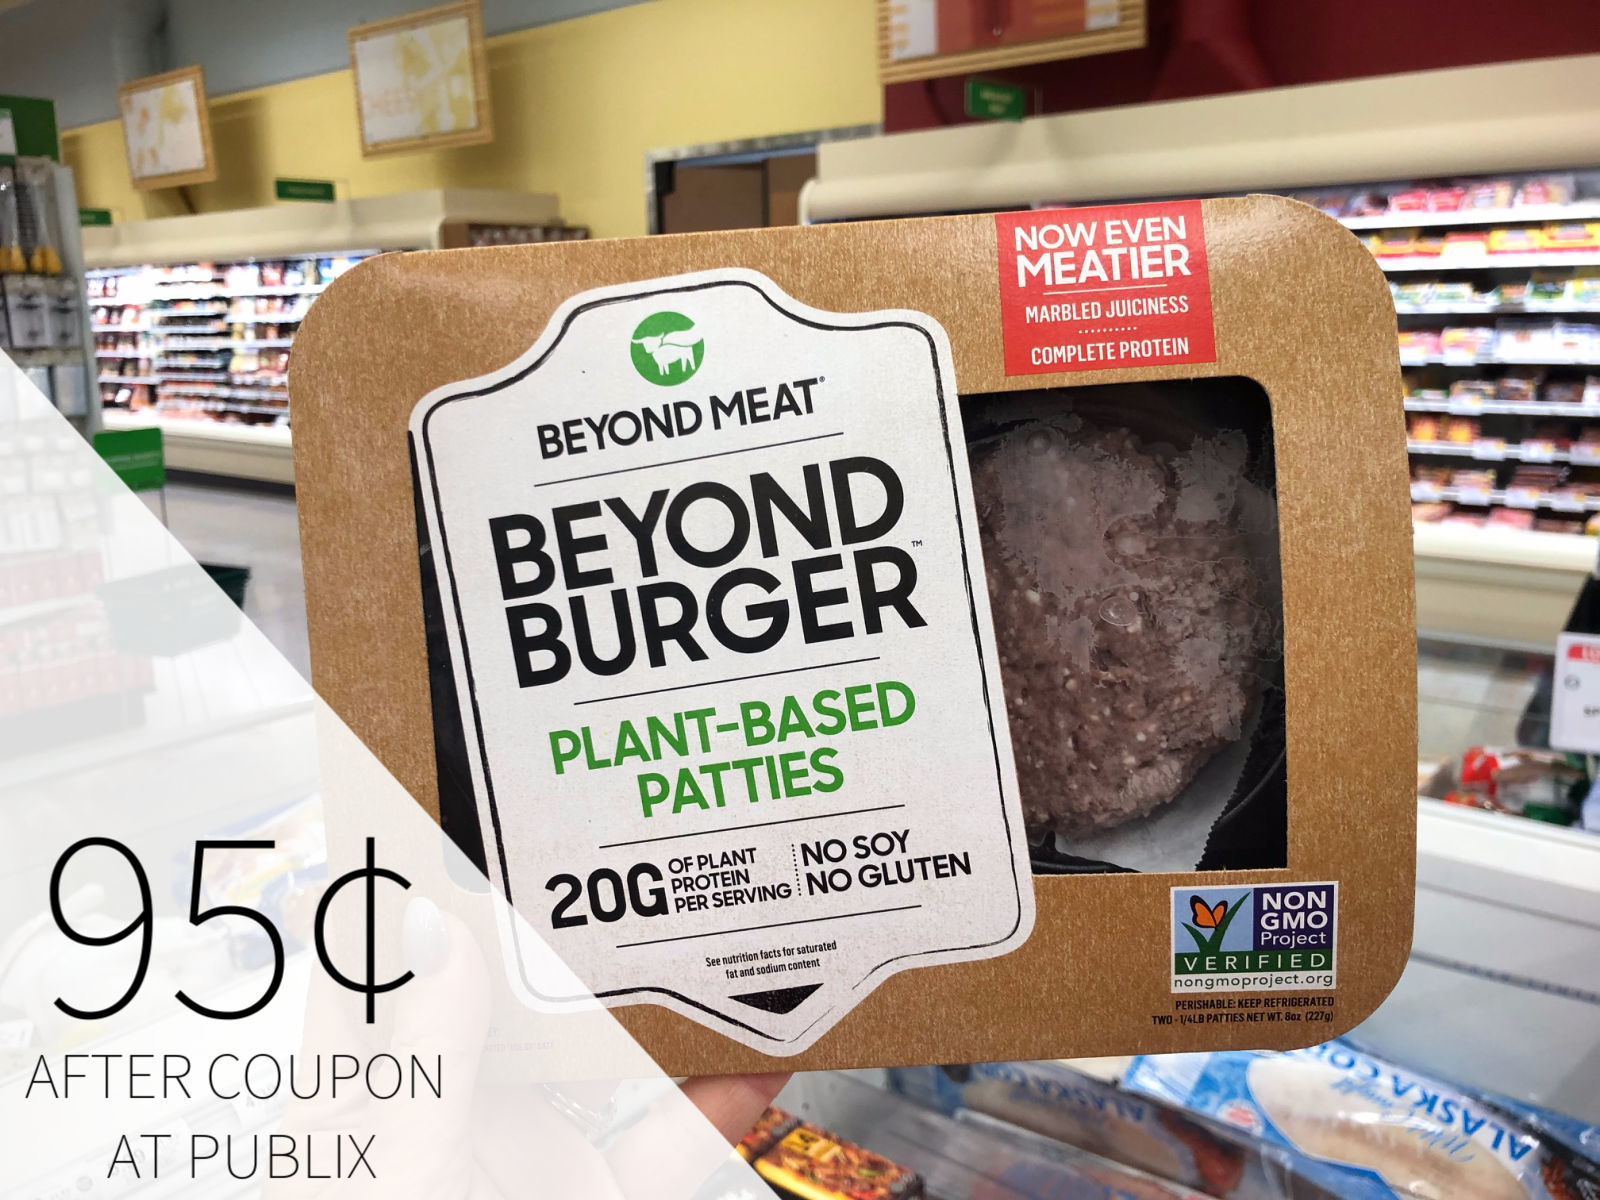 Beyond Meat The Beyond Burger Just $1.95 At Publix on I Heart Publix 3